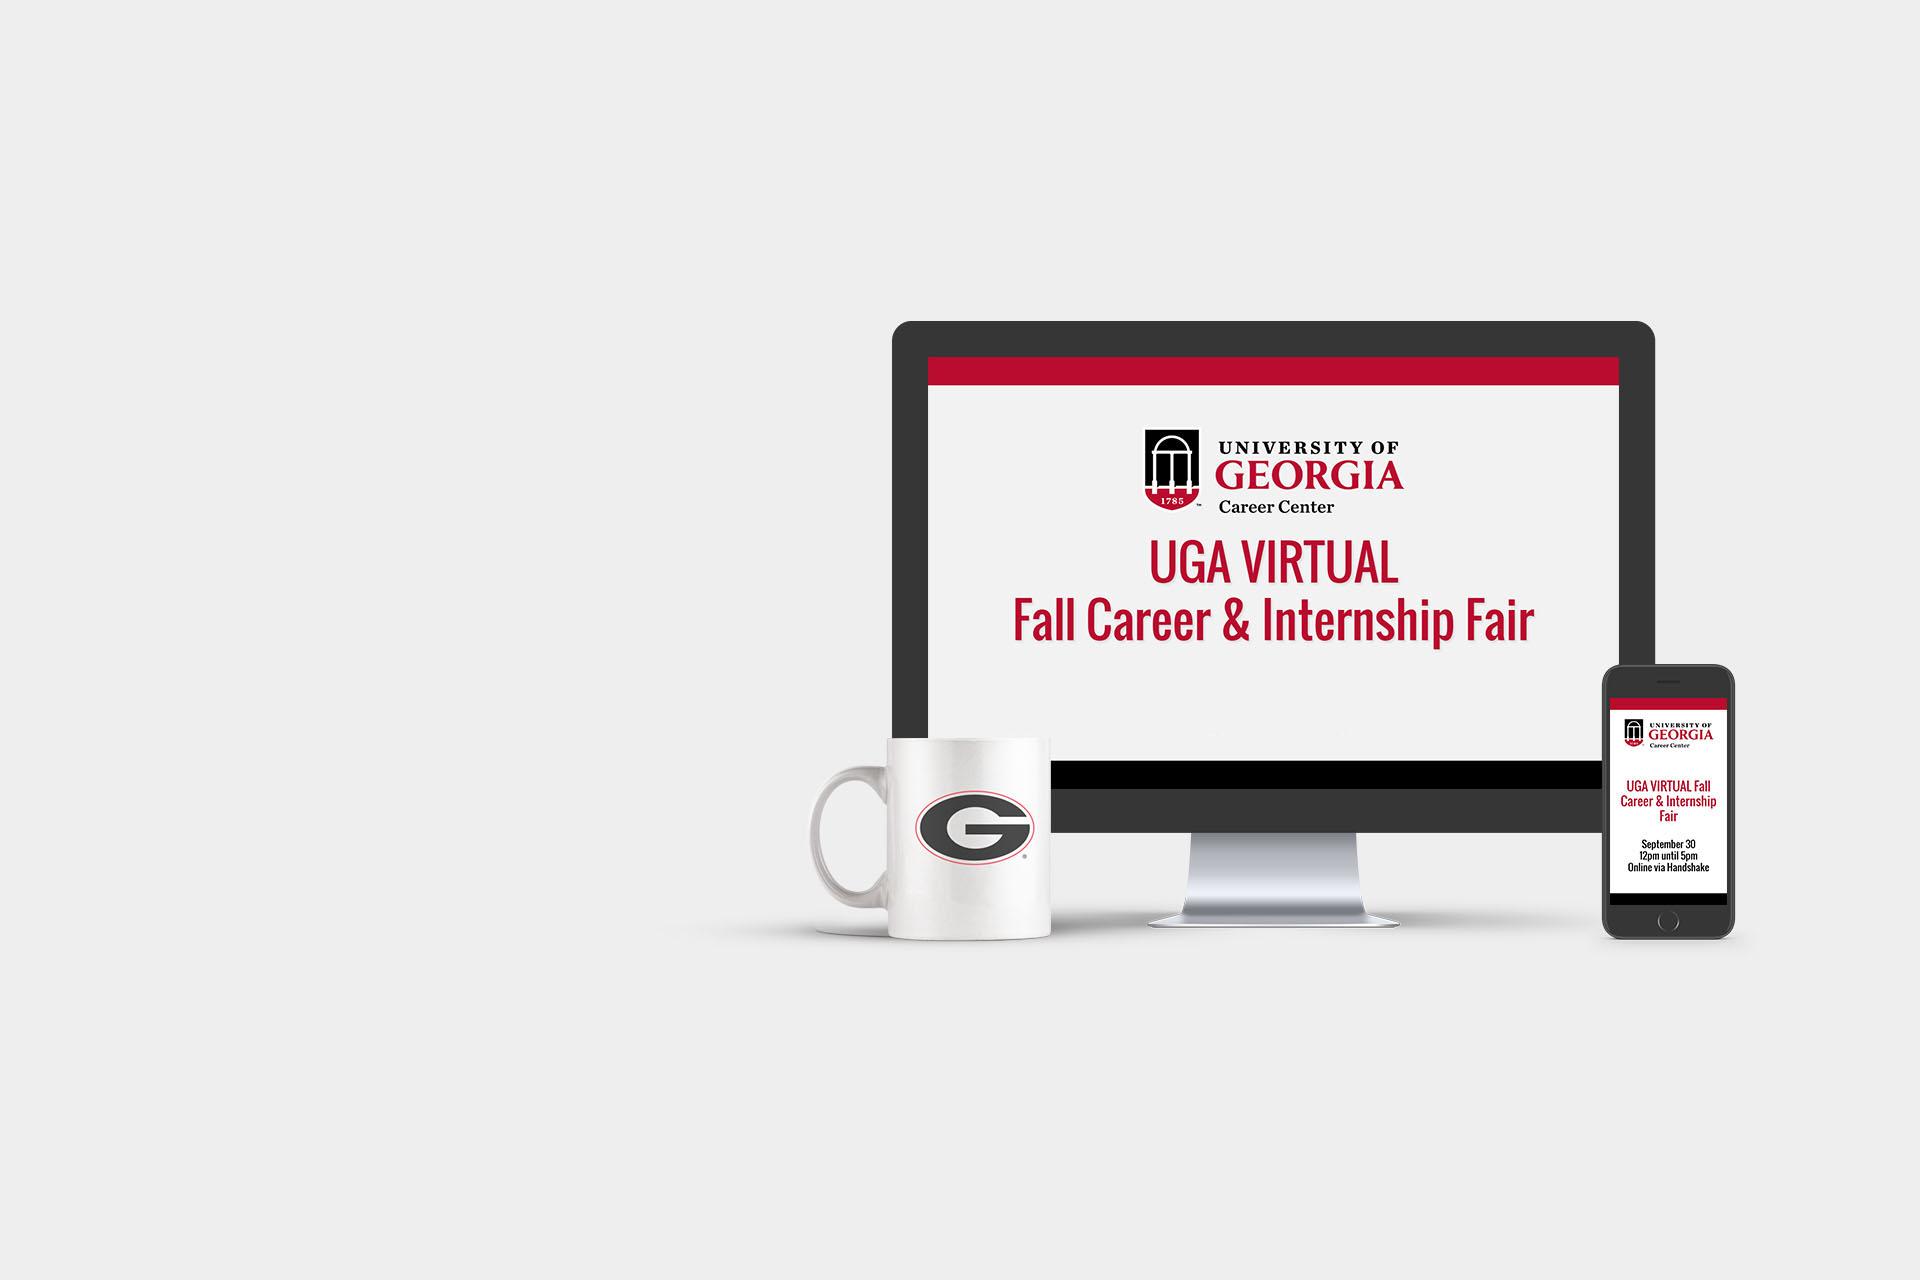 UGA VIRTUAL Fall Career & Internship Fair - October 13 from 12pm until 5pm online via Handshake